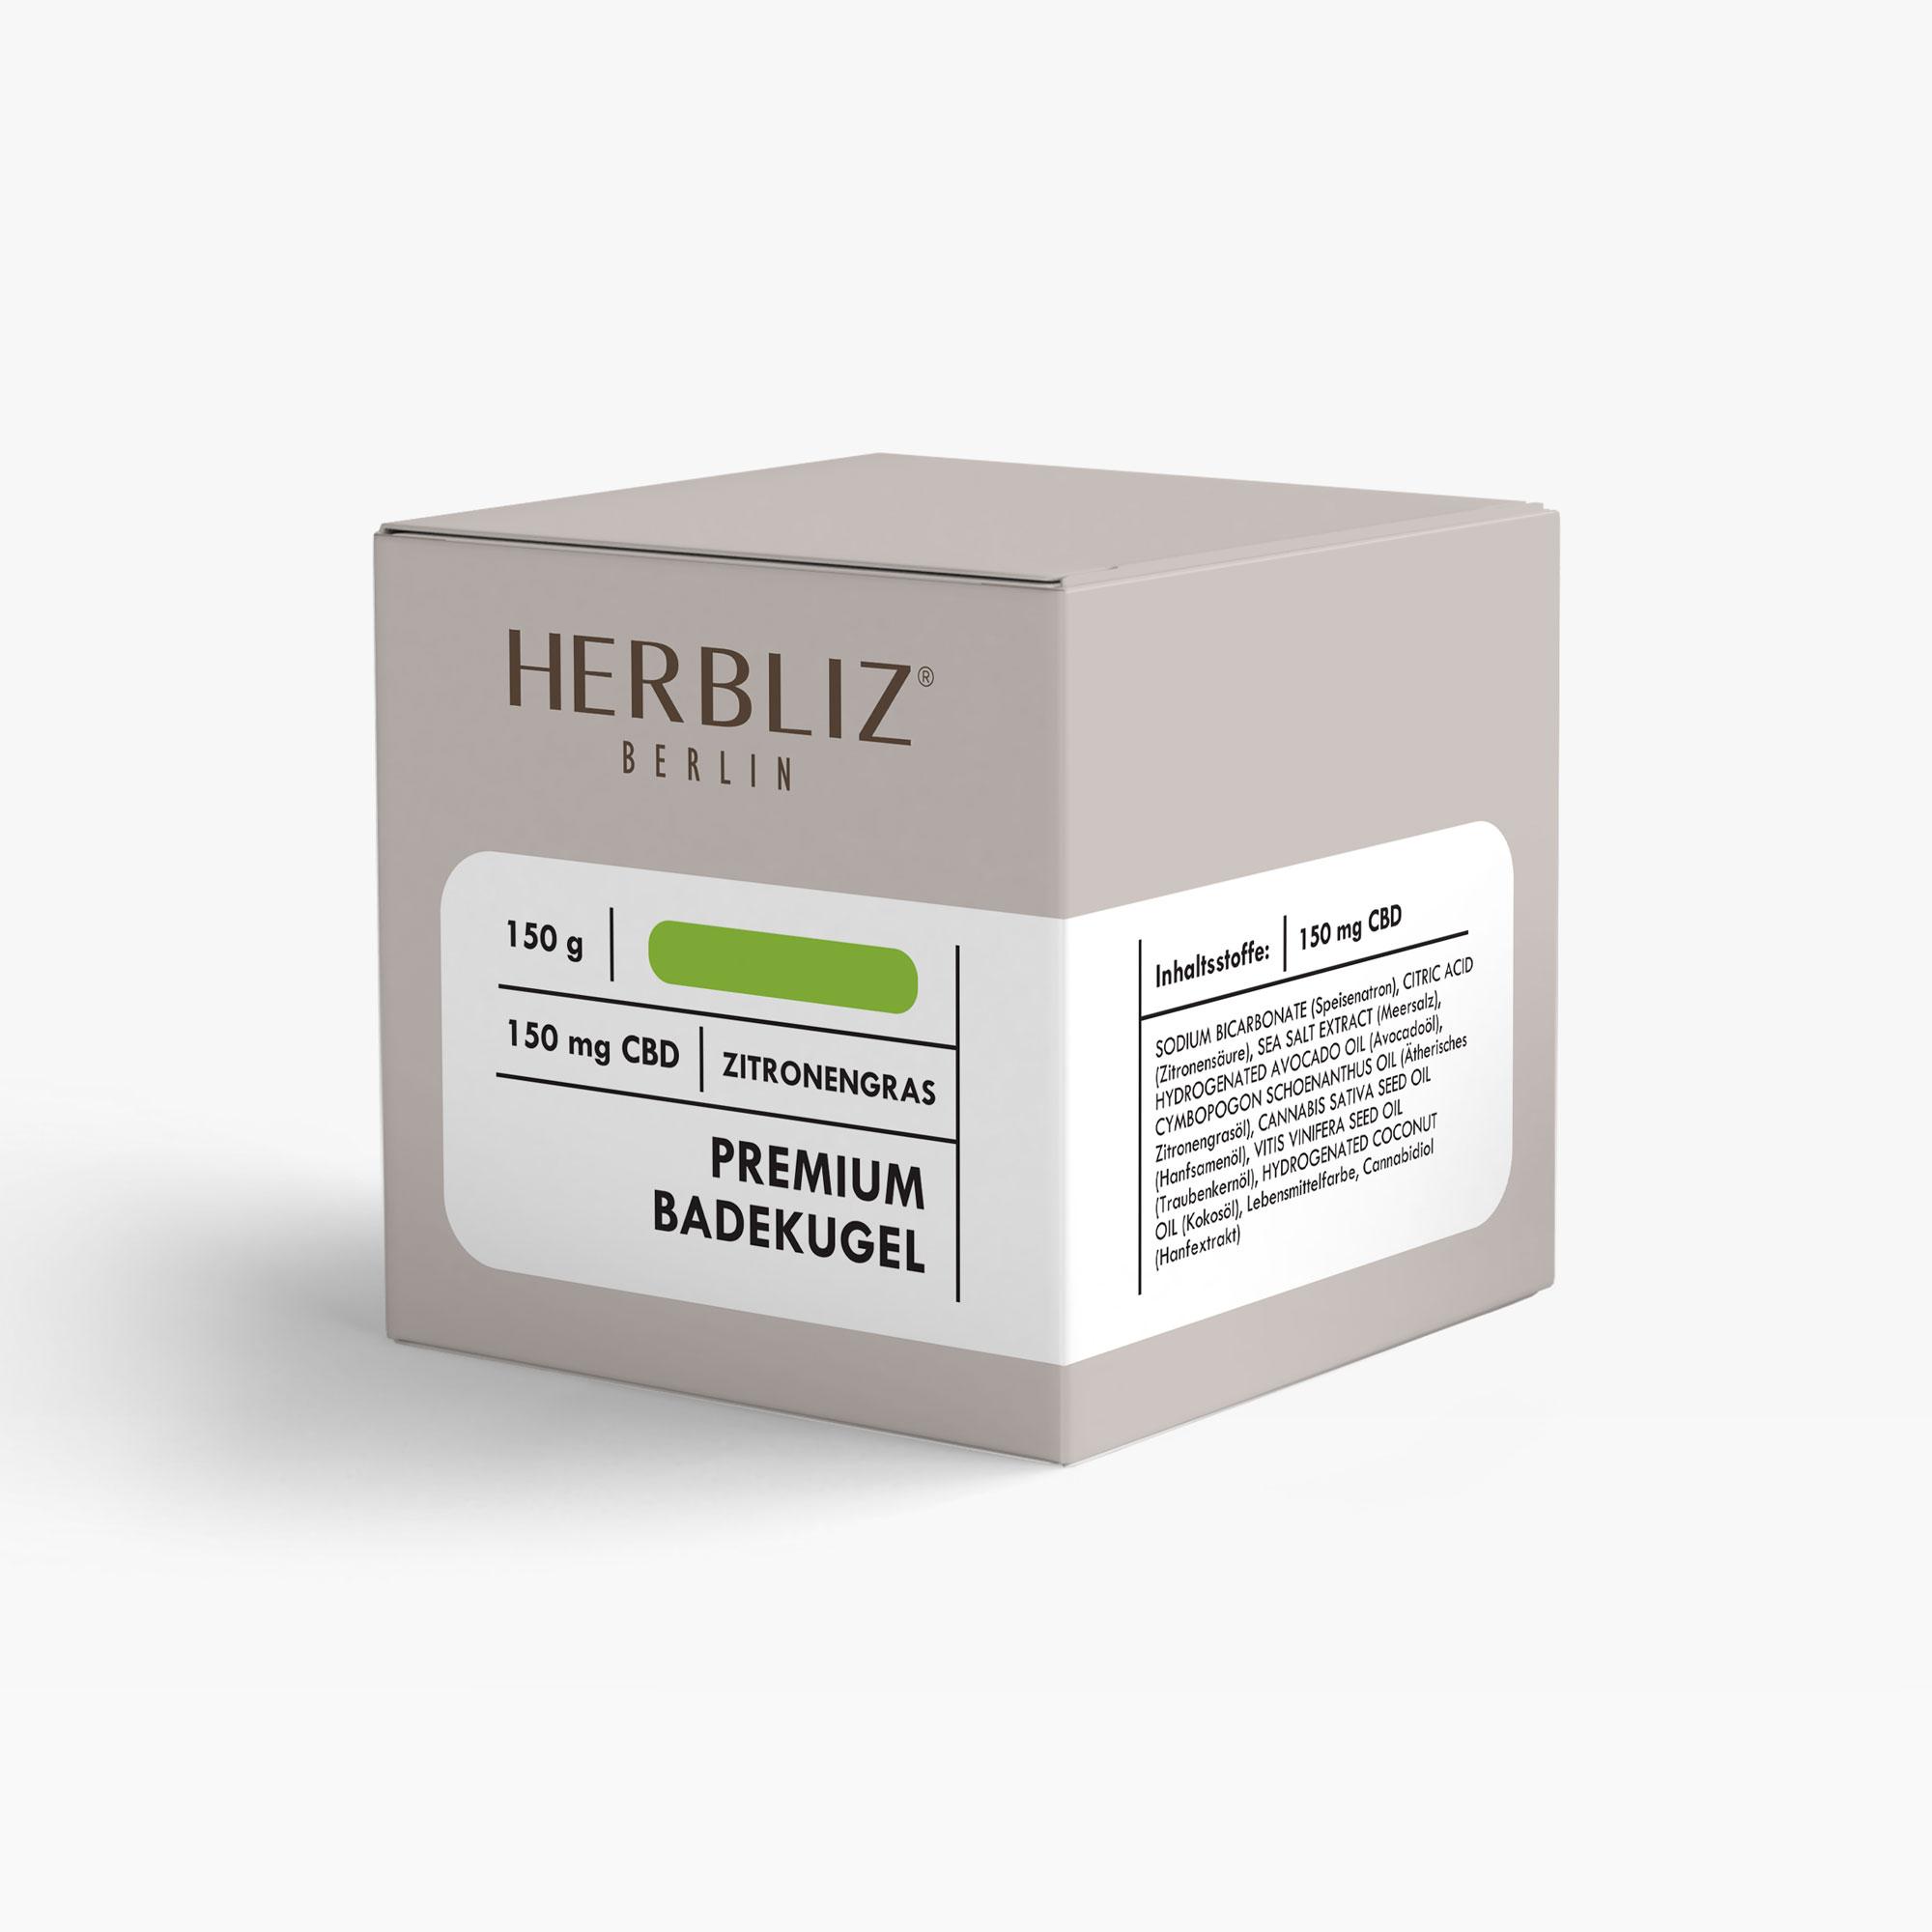 HERBLIZ CBD Badekugel - Zitronengras